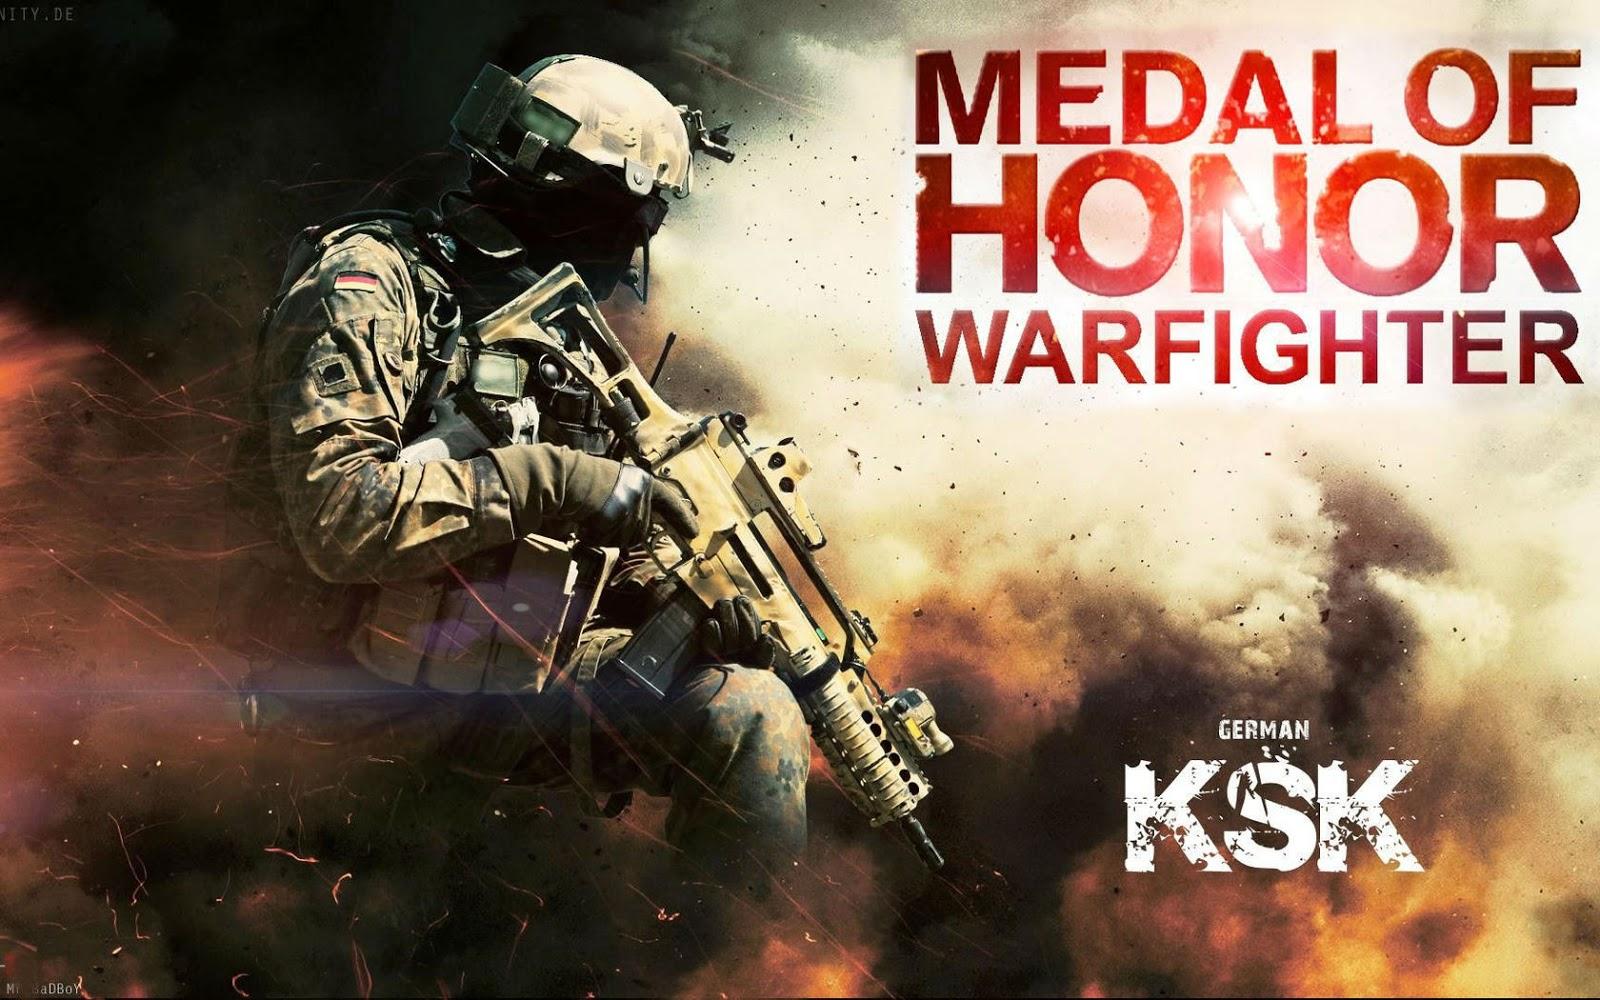 moh warfighter wallpaper hd - photo #14